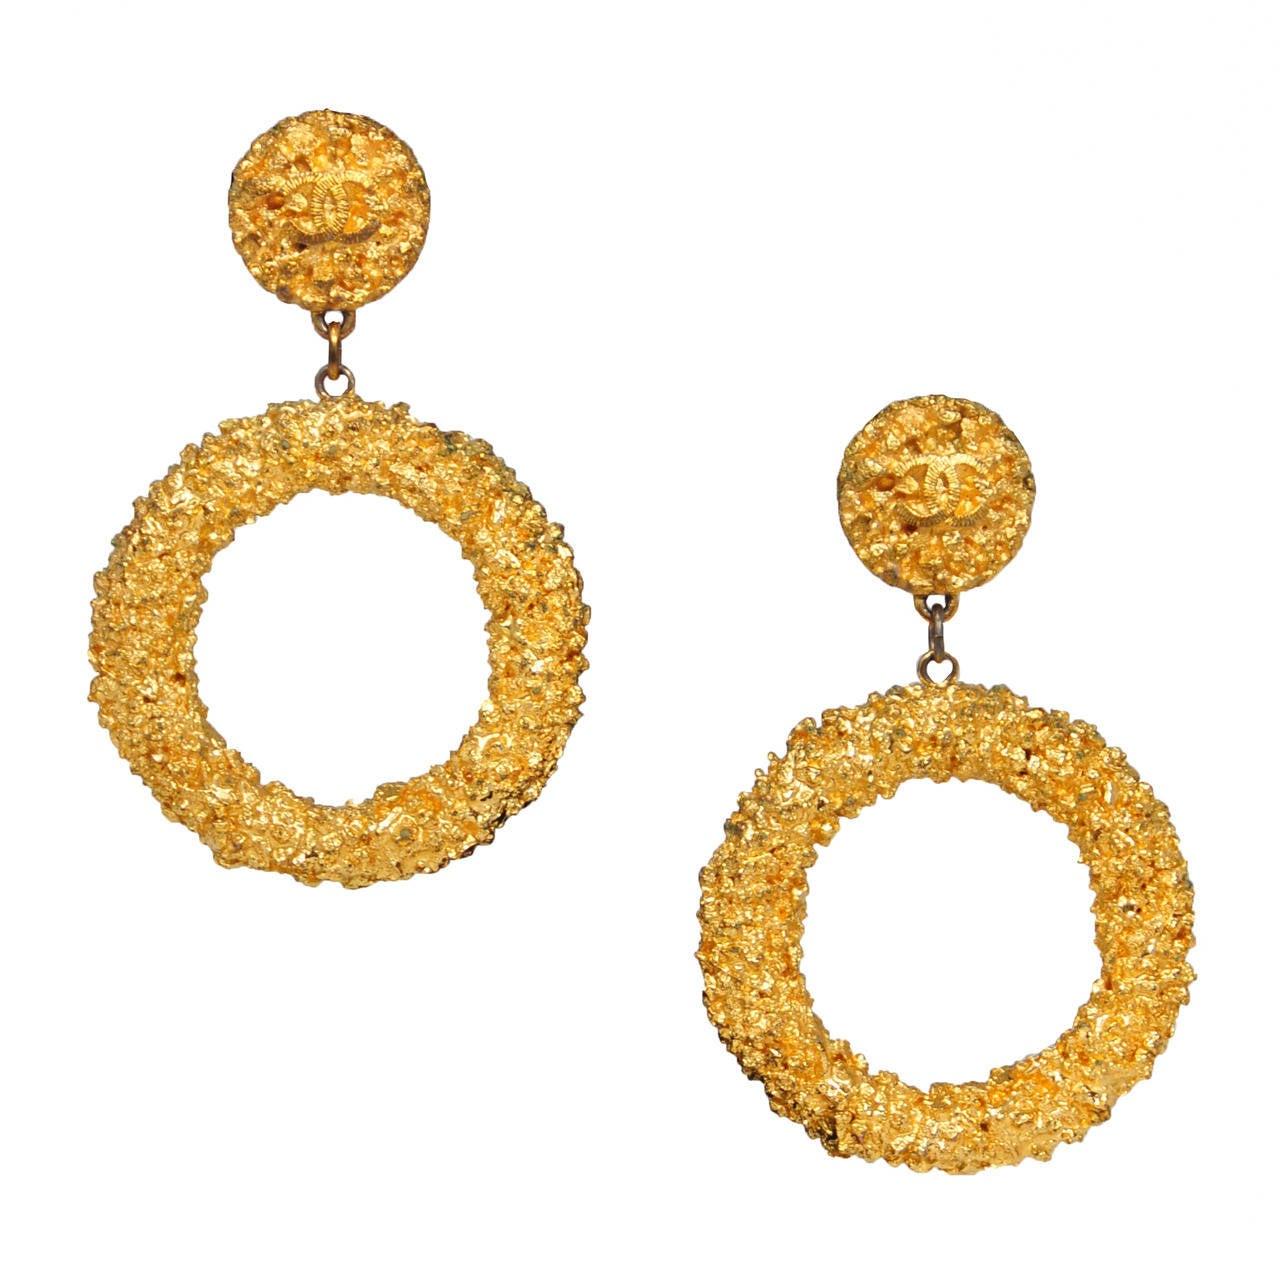 chanel gold hoop earrings at 1stdibs